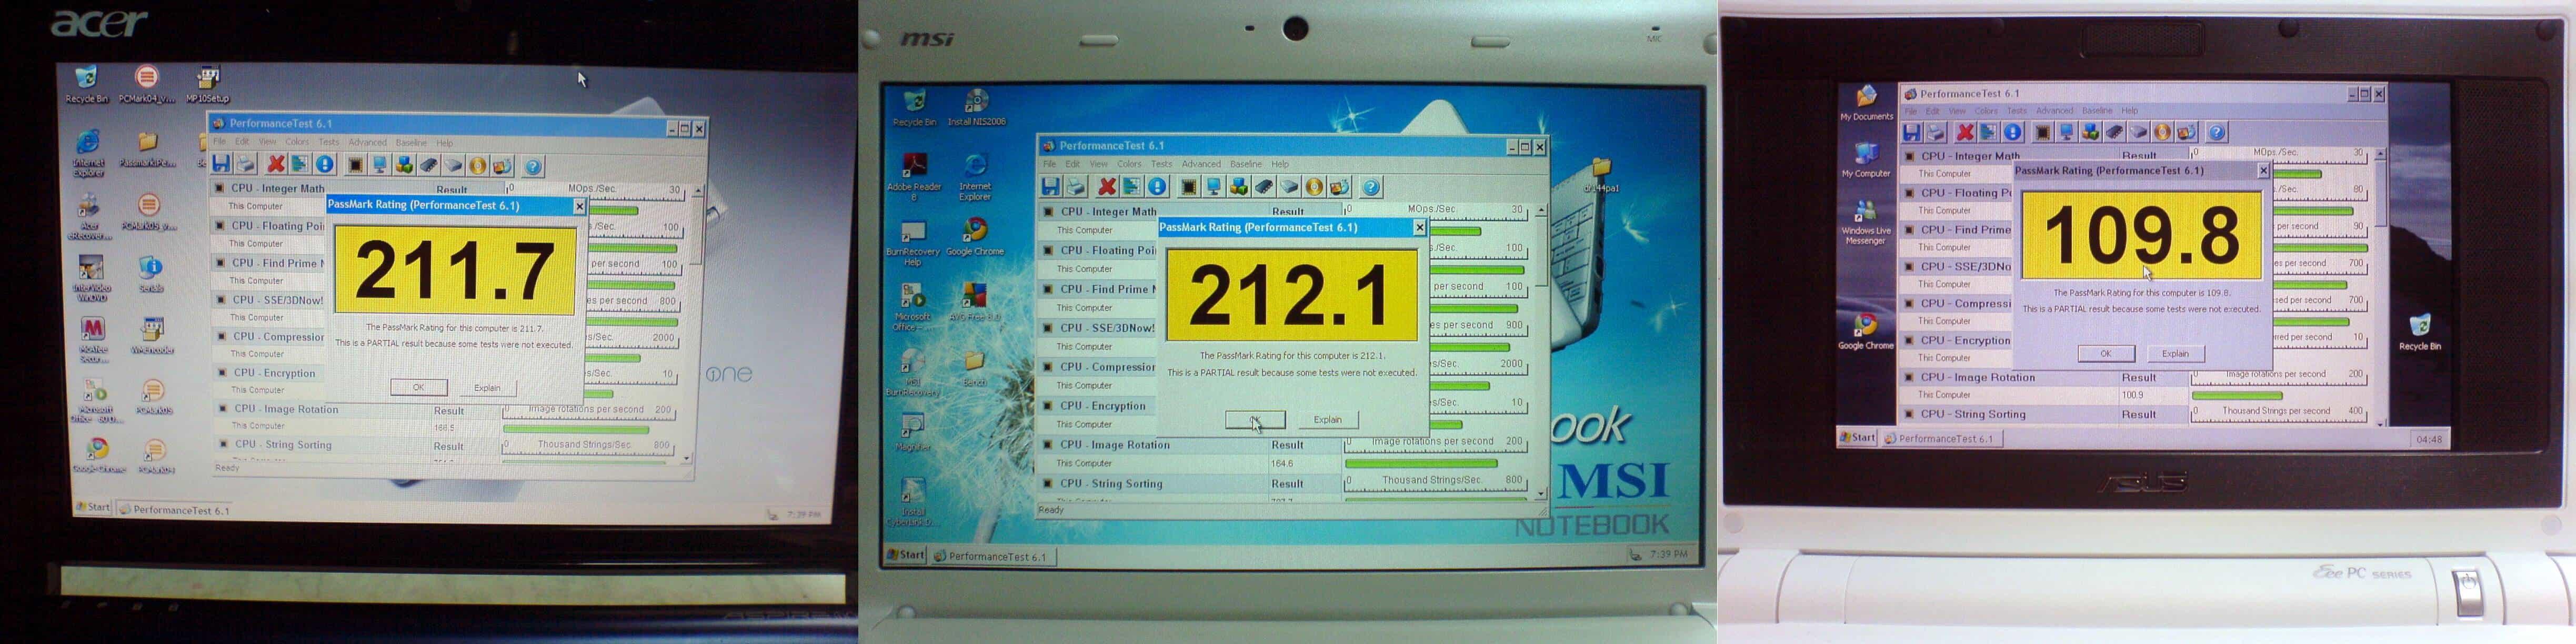 Acer Aspire One MSI Wind U100 Asus Eee PC Benchmarks